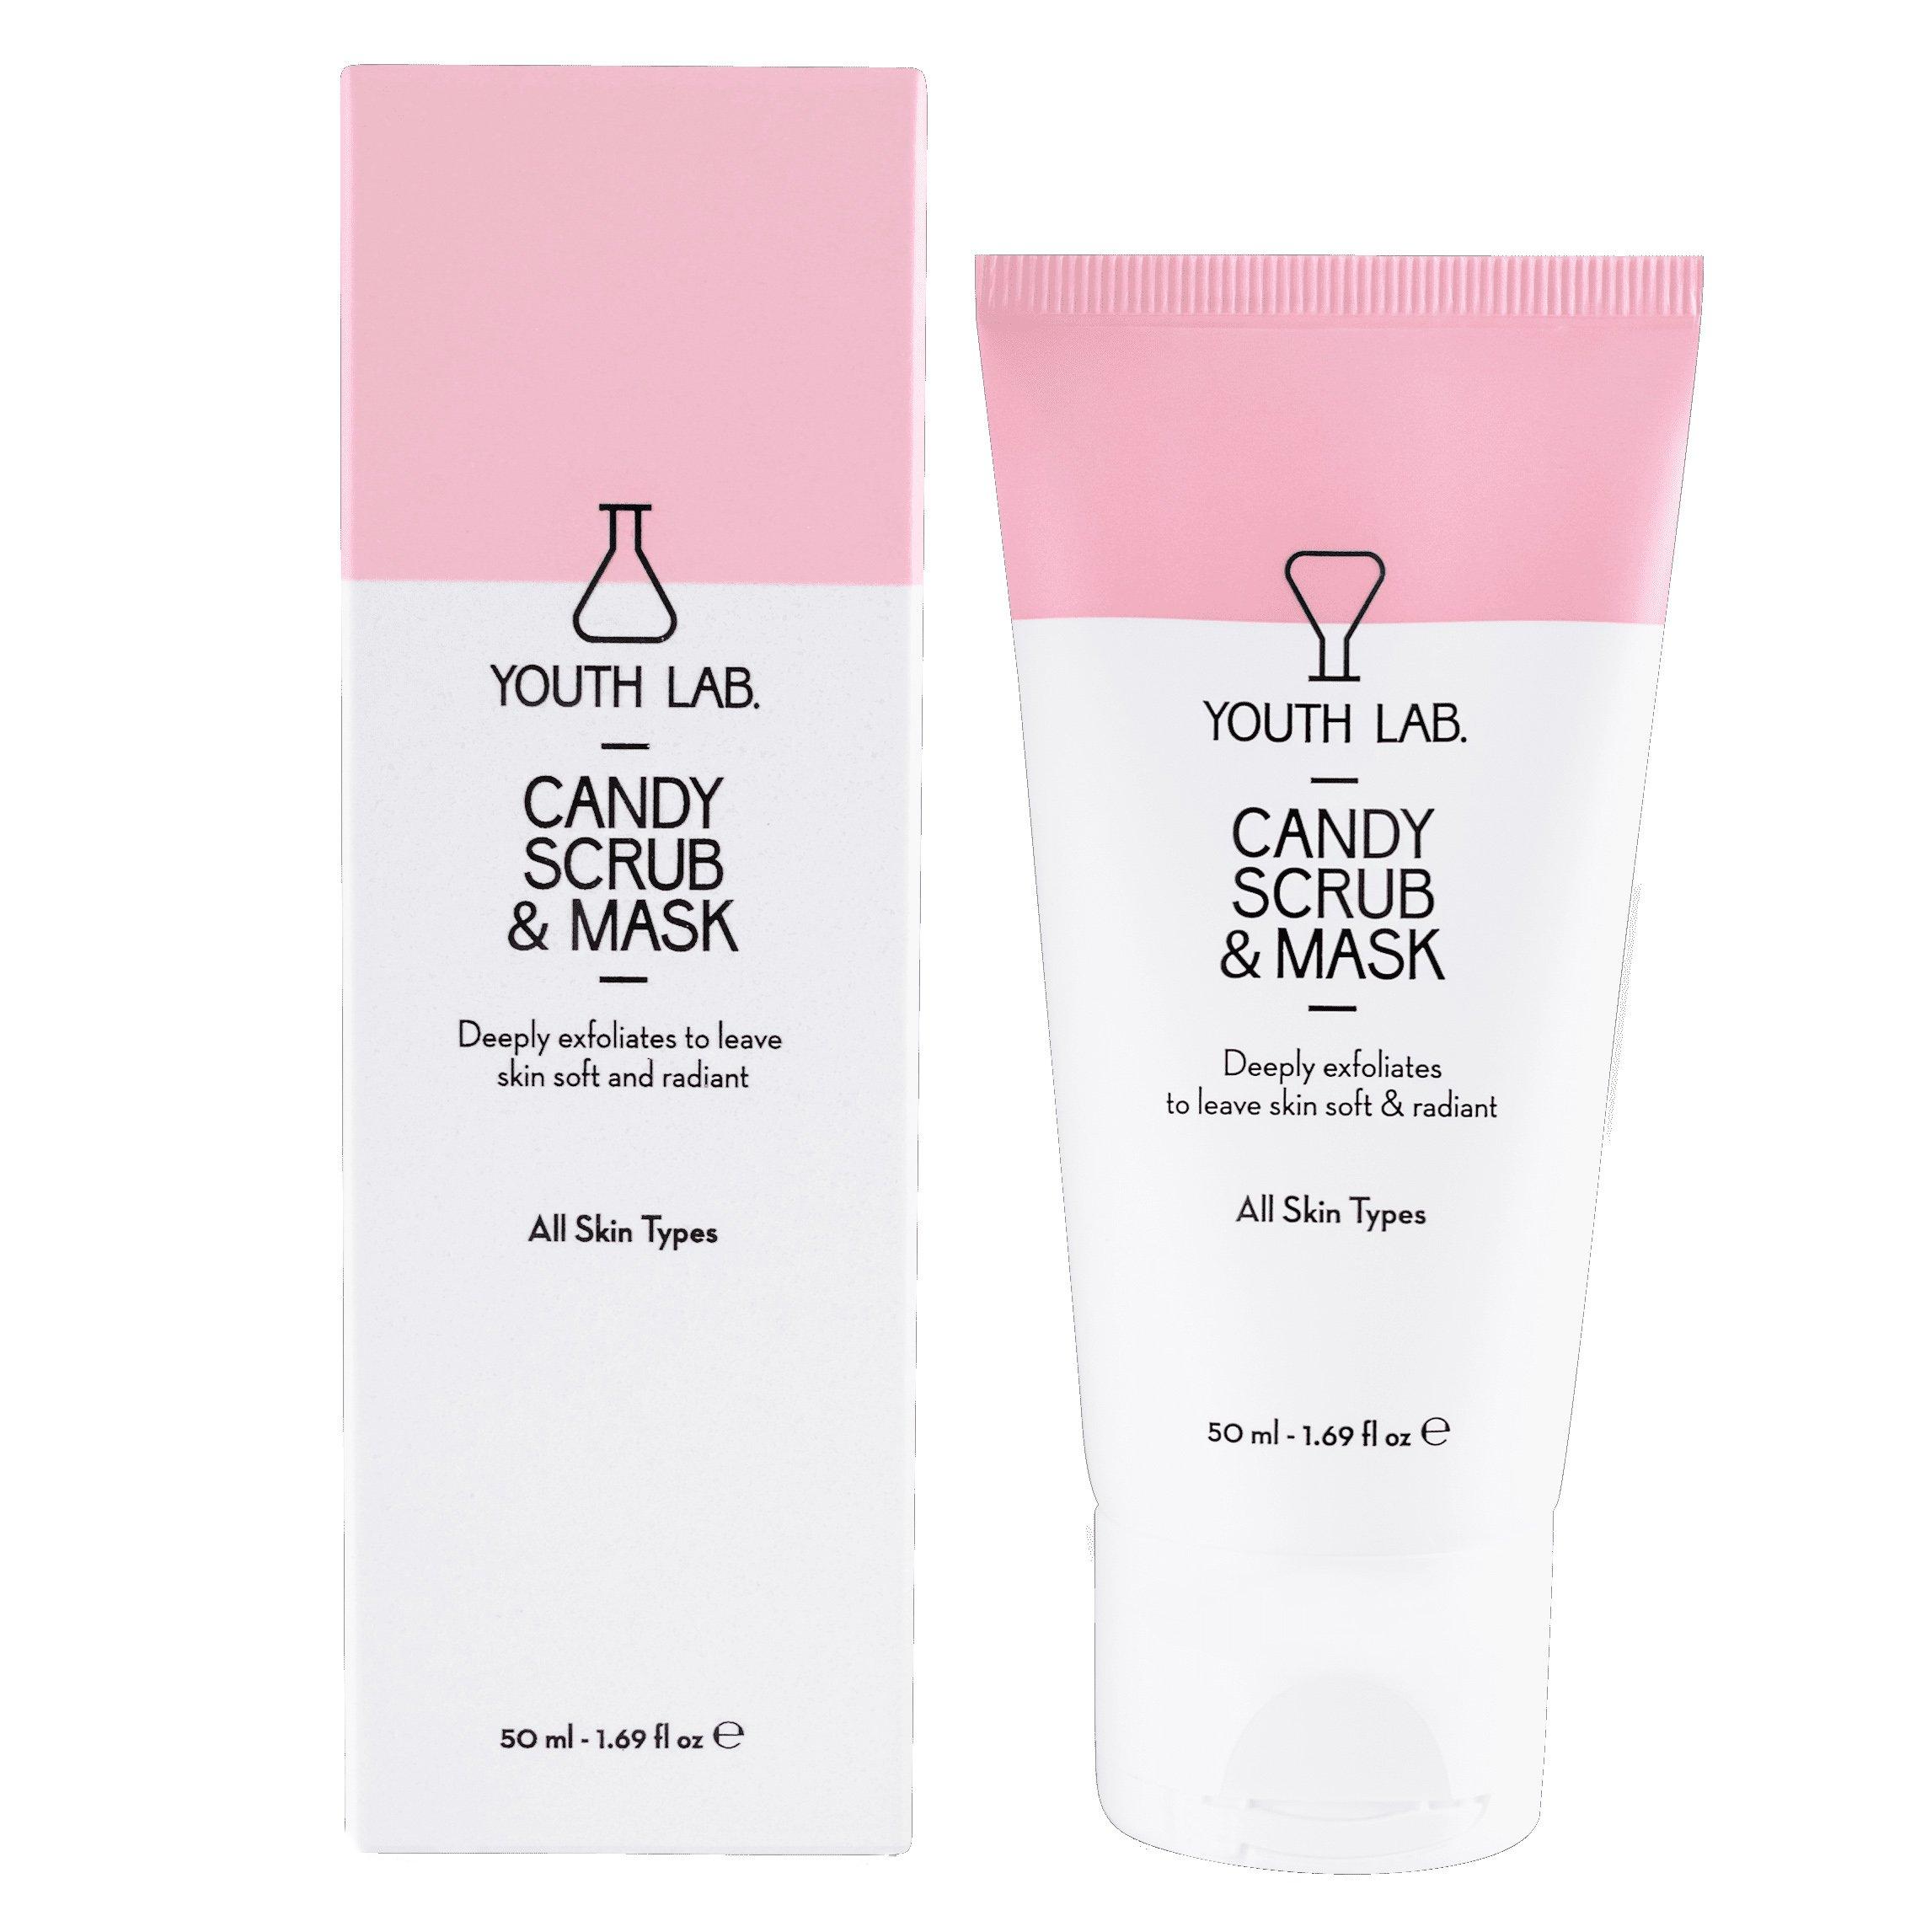 YOUTH LAB. Candy Scrub & Mask Κρέμα Απολέπισης & Μάσκα Προσώπου για Εξισορρόπηση & Απαλότητα της Επιδερμίδας 50ml